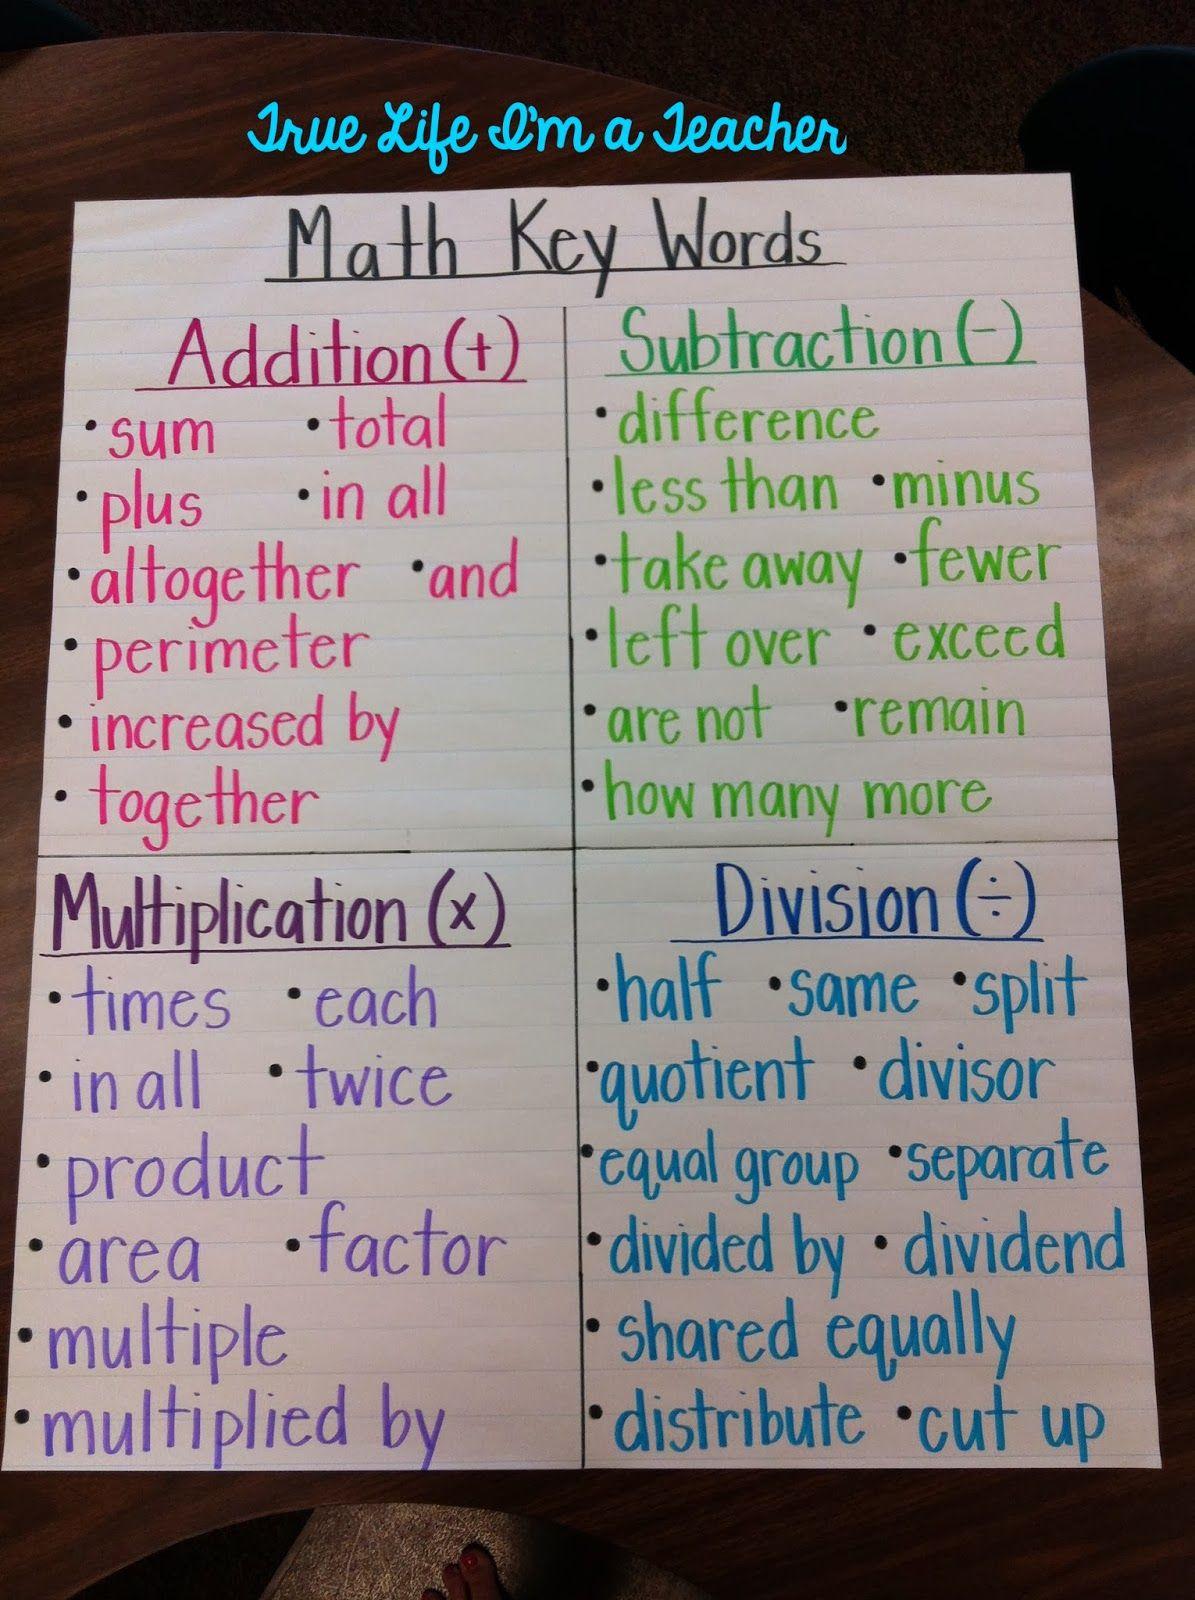 True Life: I'm A Teacher!: Anchor Charts | Math Key Words